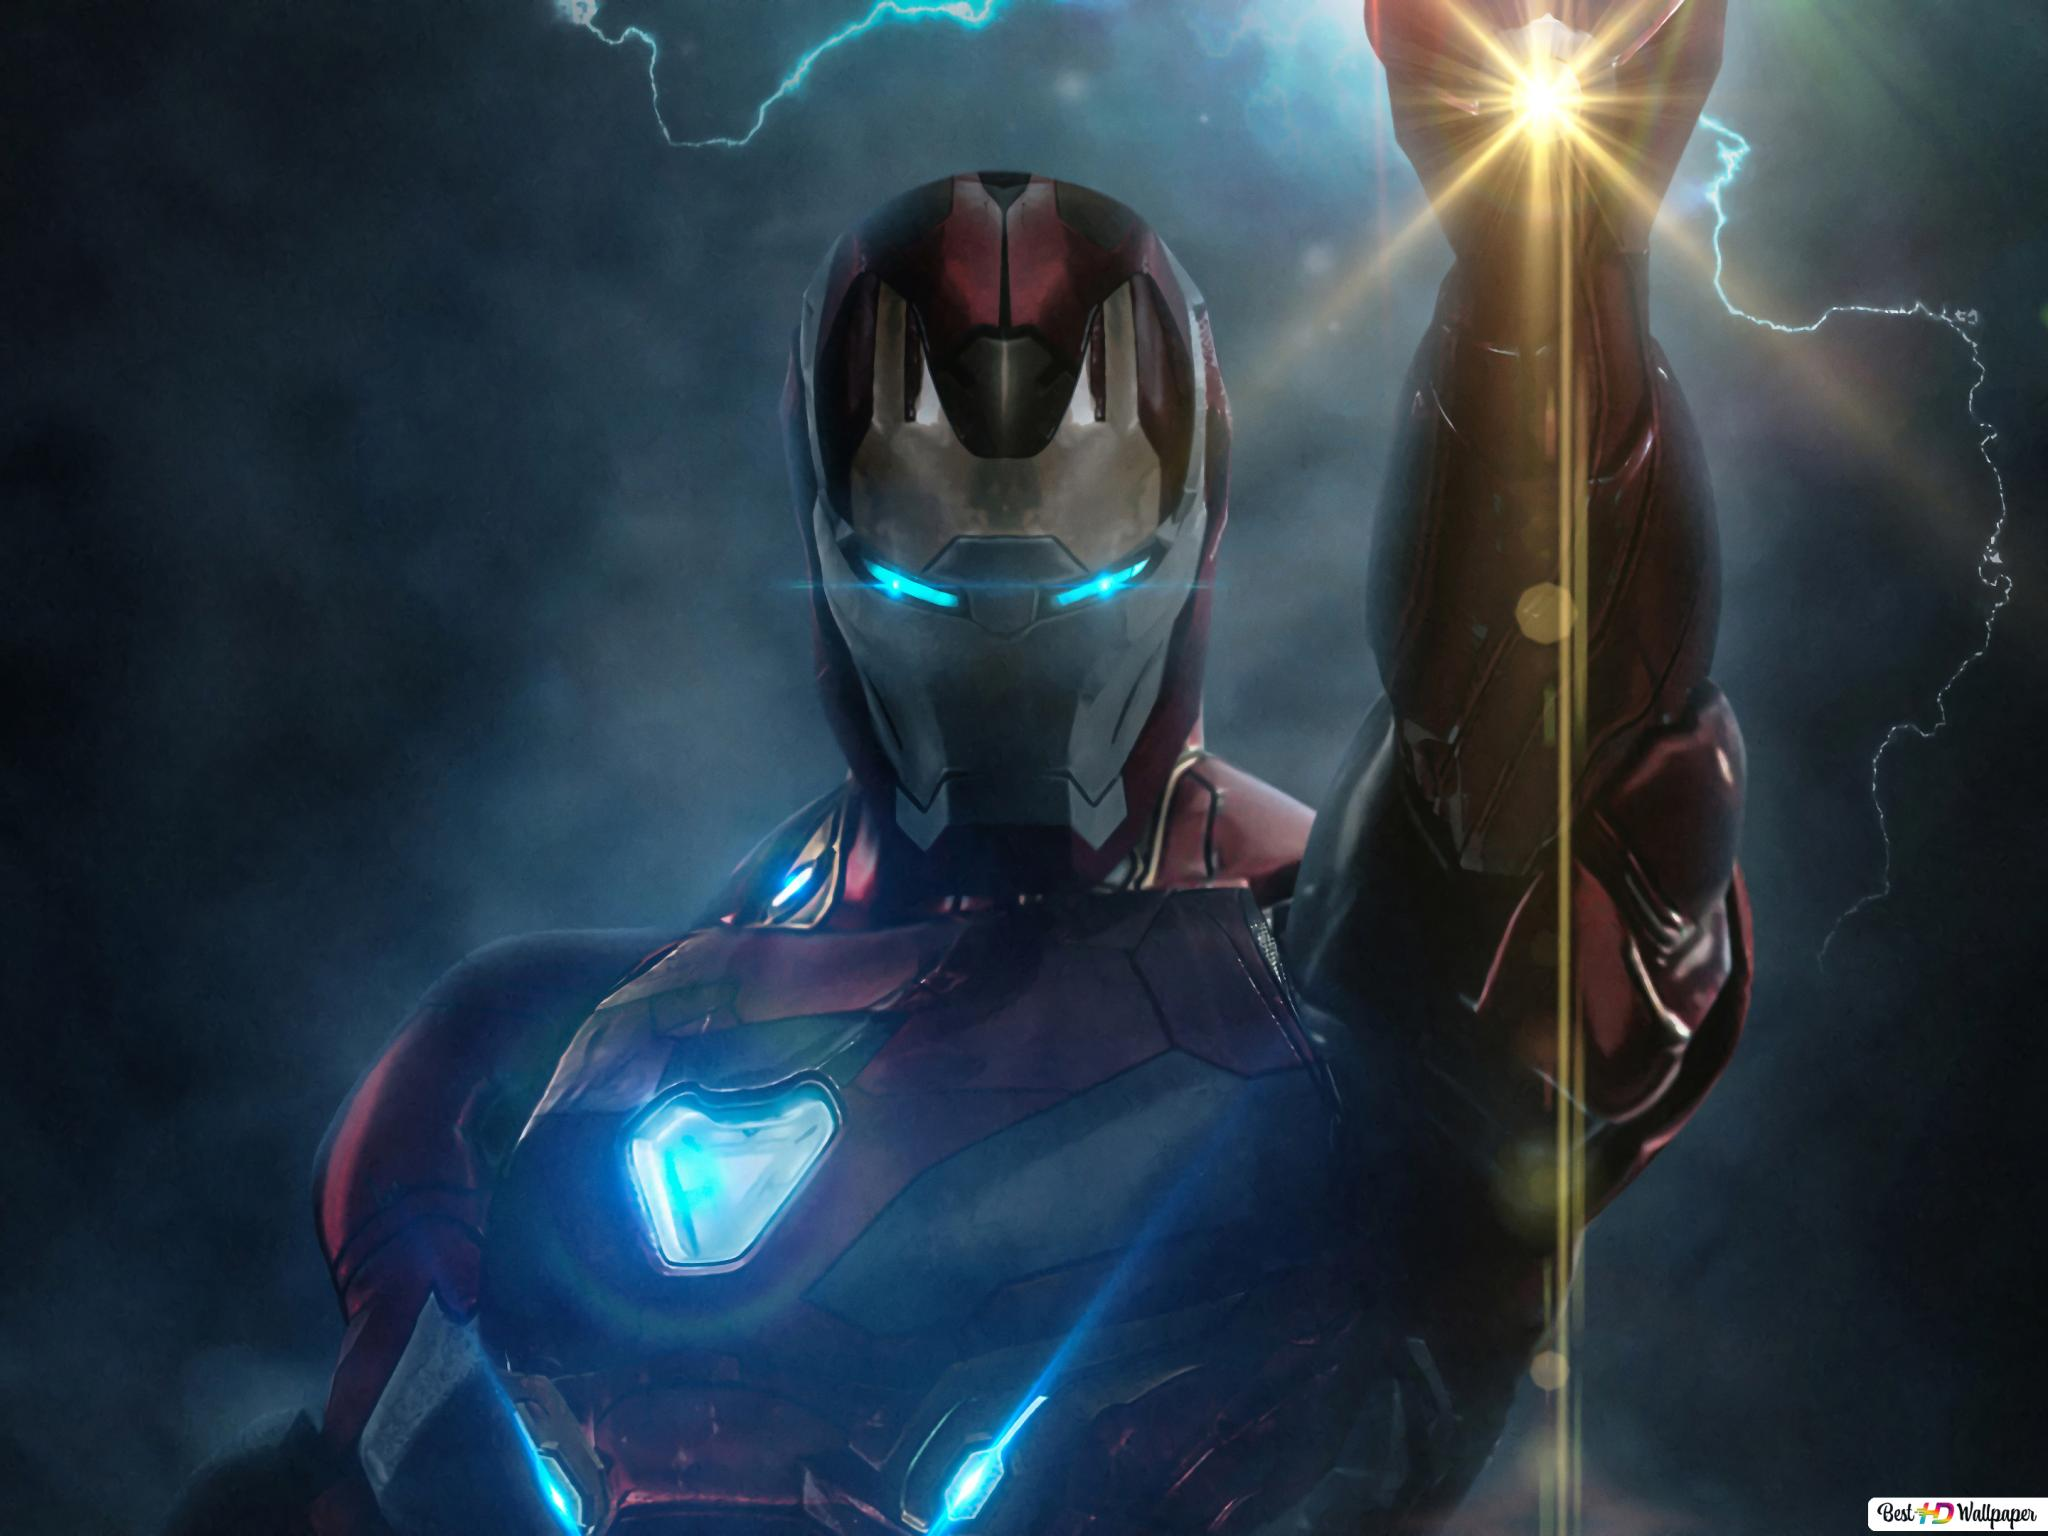 Avengers Endgame Film Iron Man Powers Hd Fond D écran